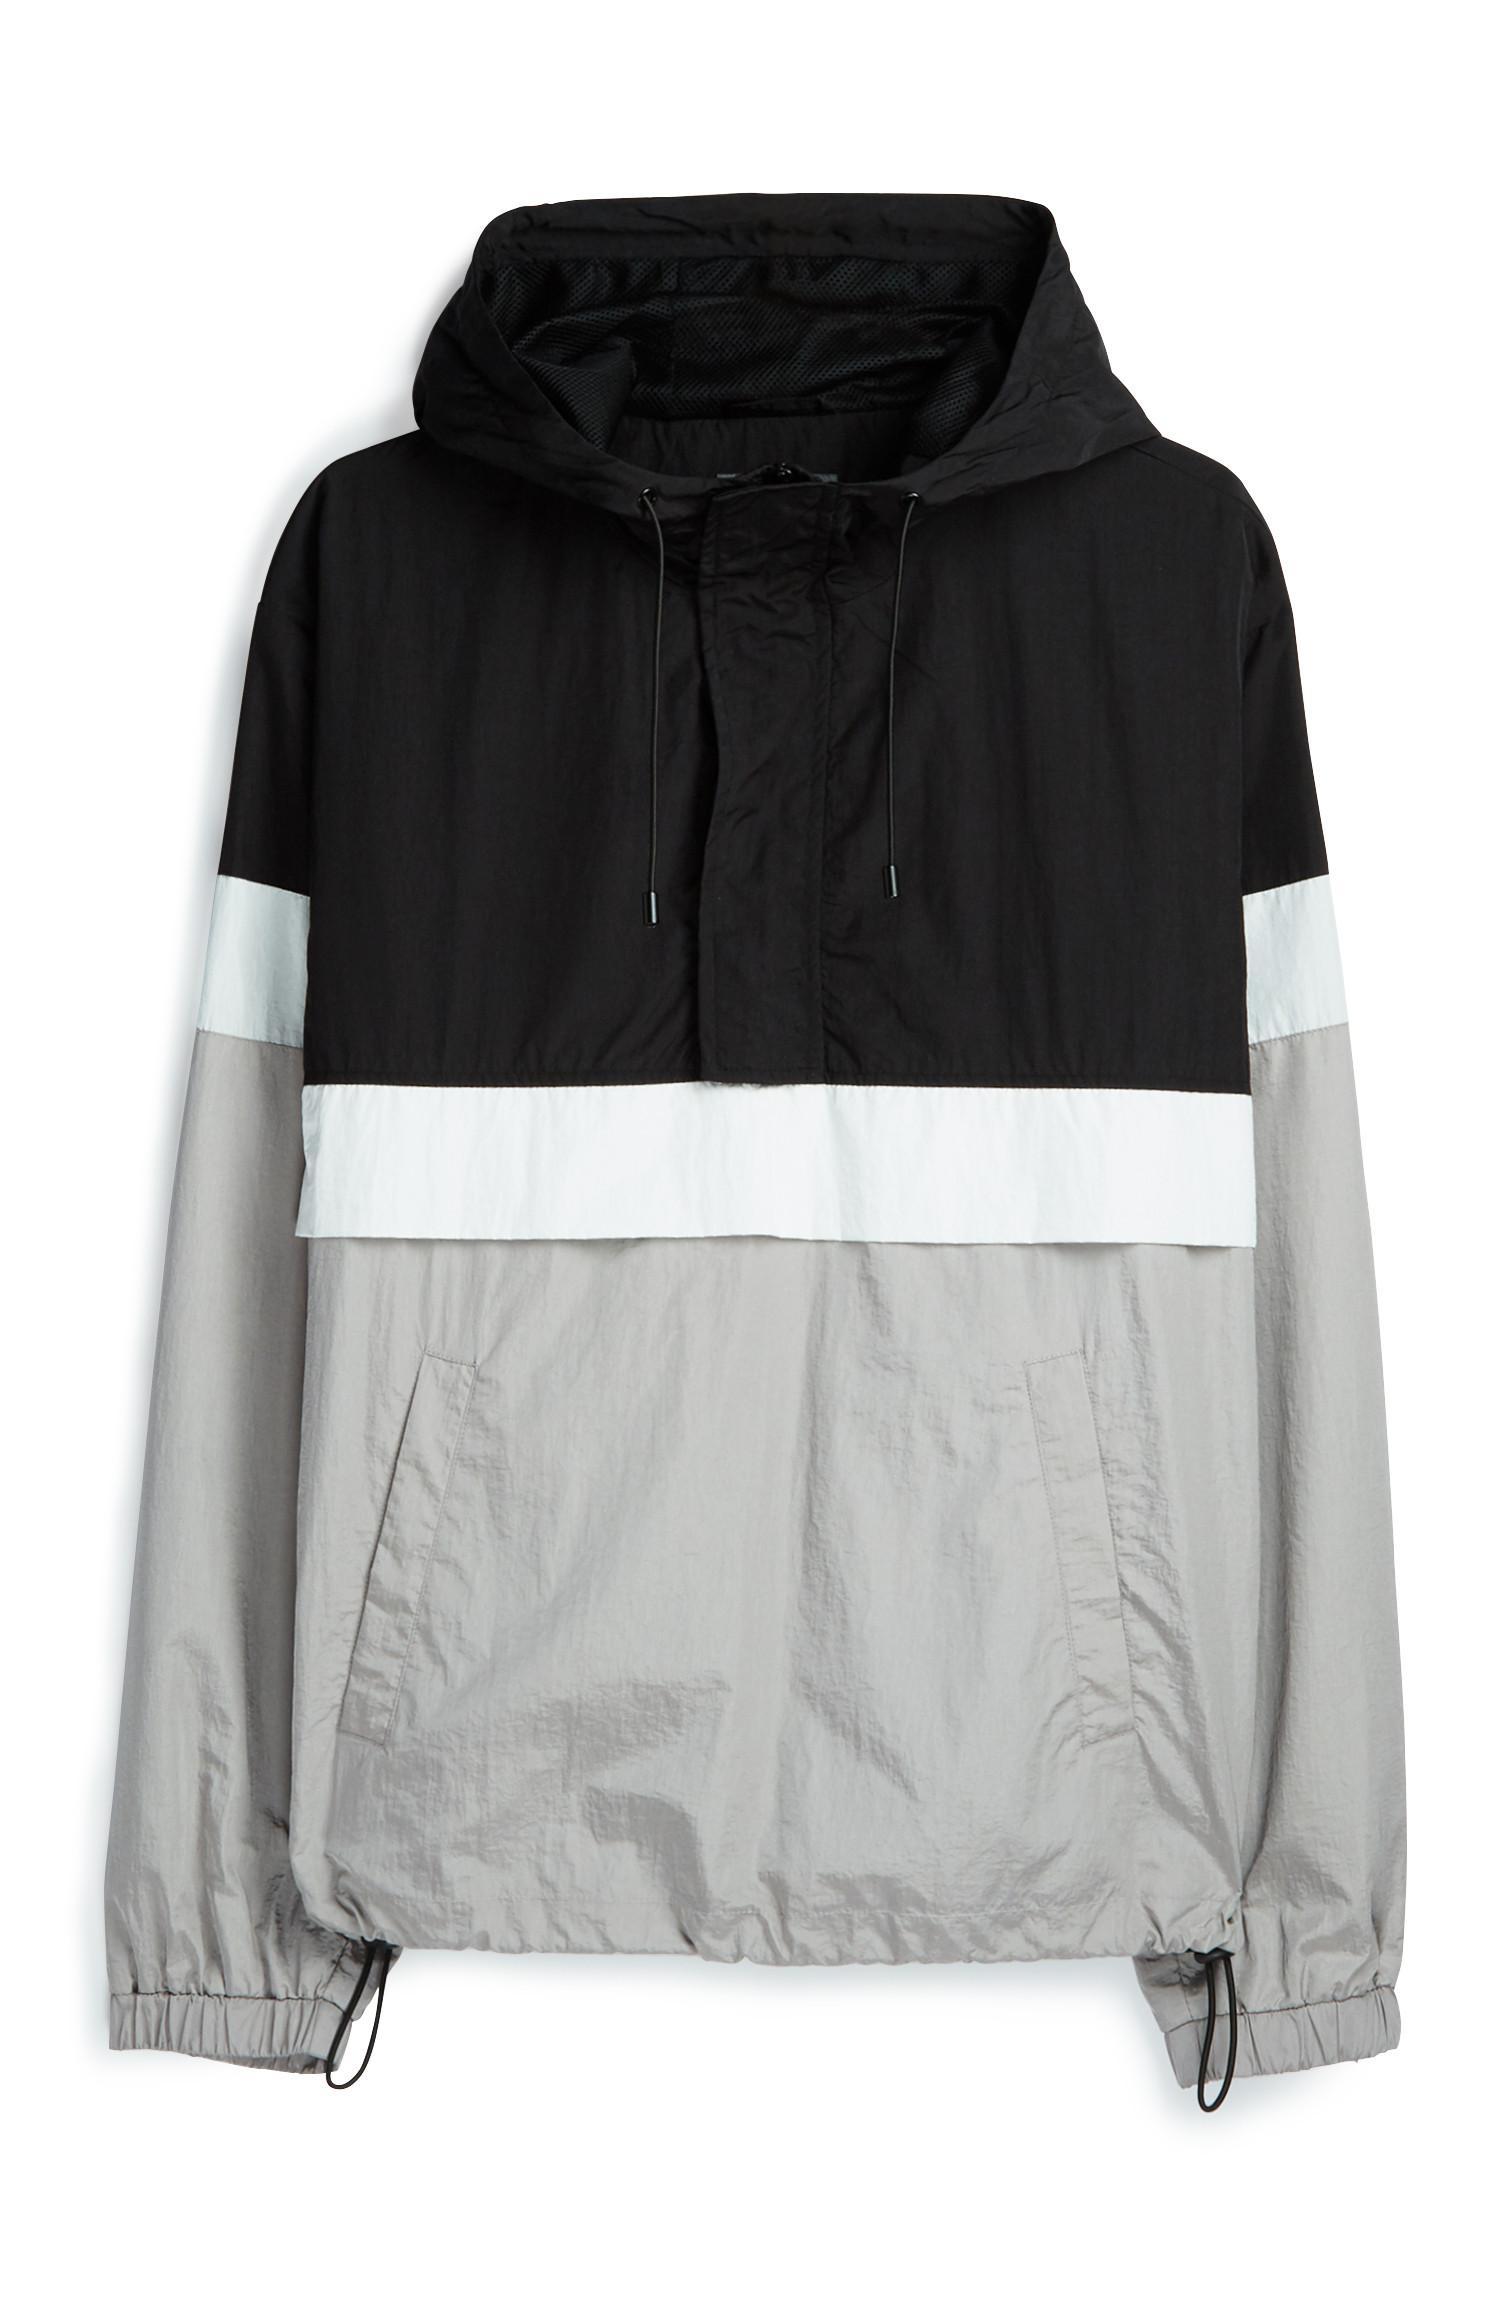 Grey And Black Jacket